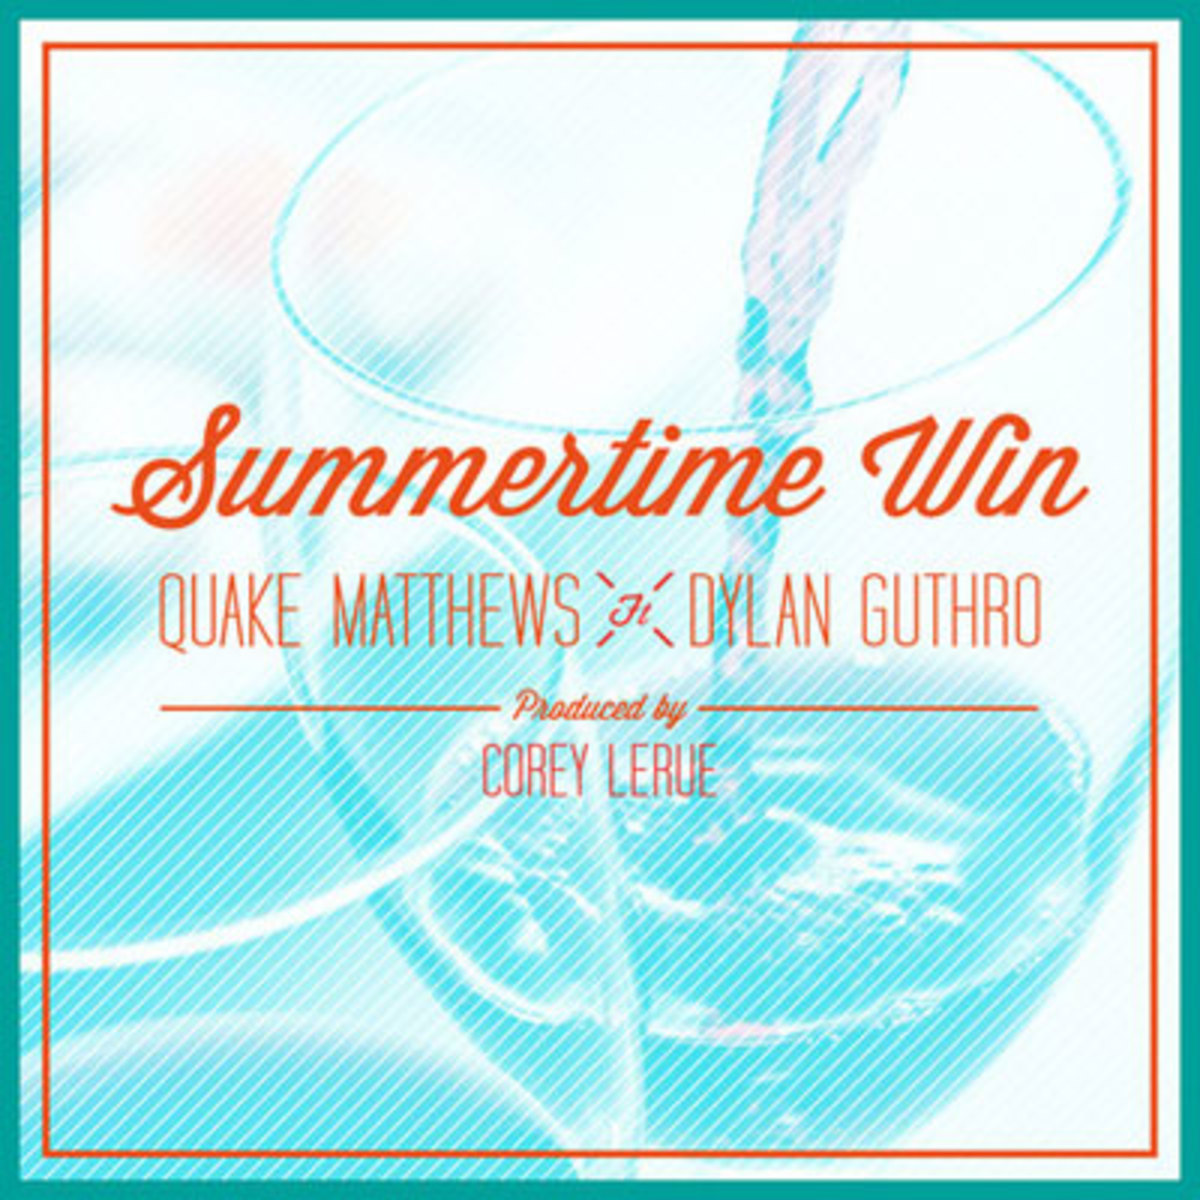 quakematthews-summertimewin.jpg